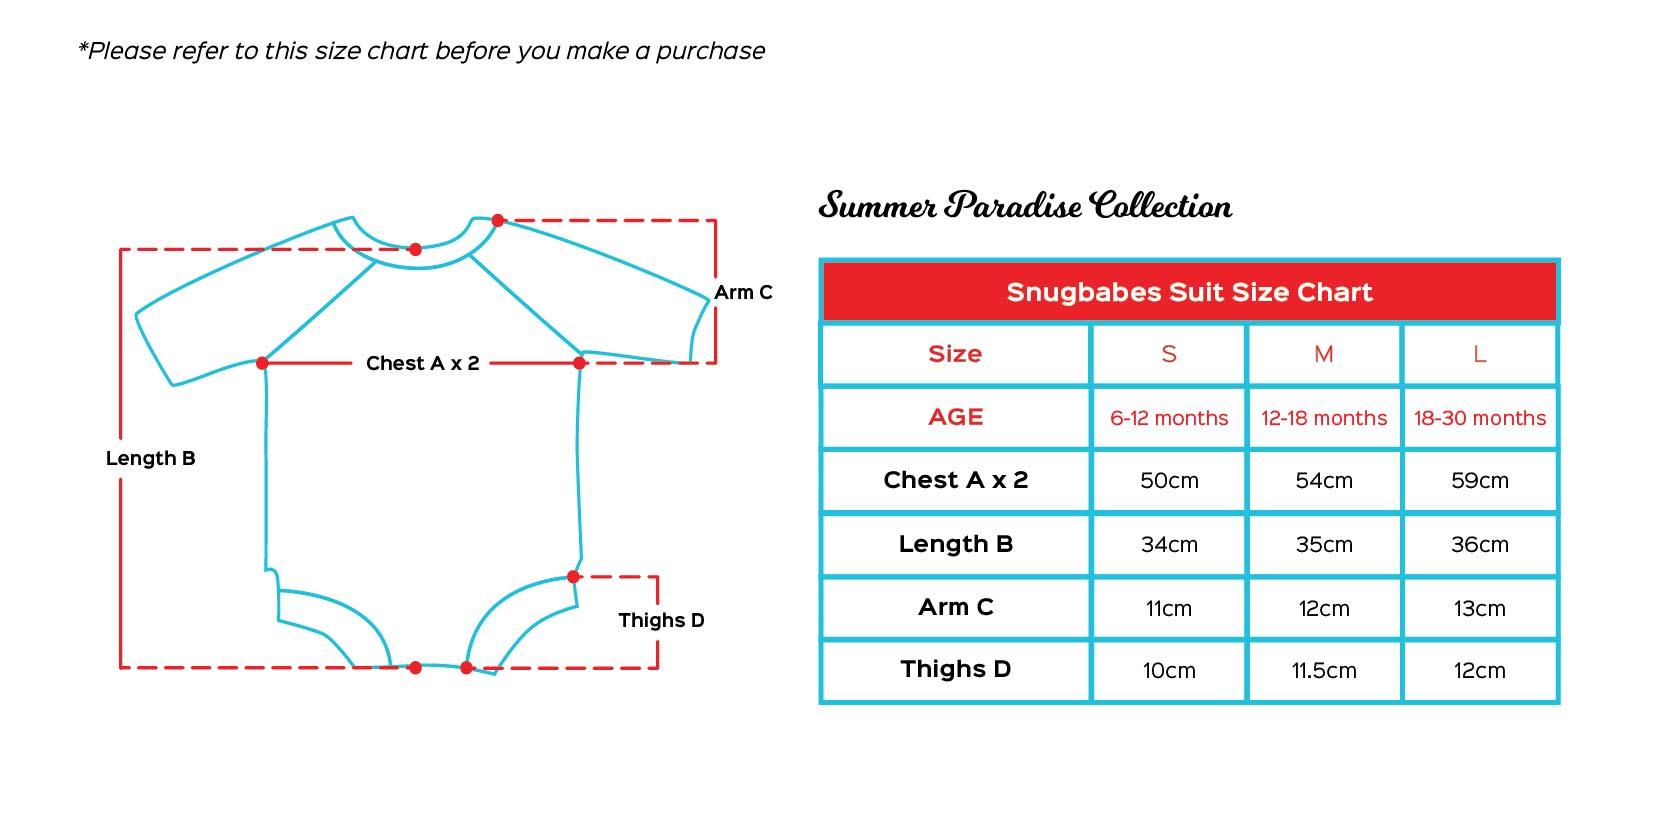 Snugbabes size chart